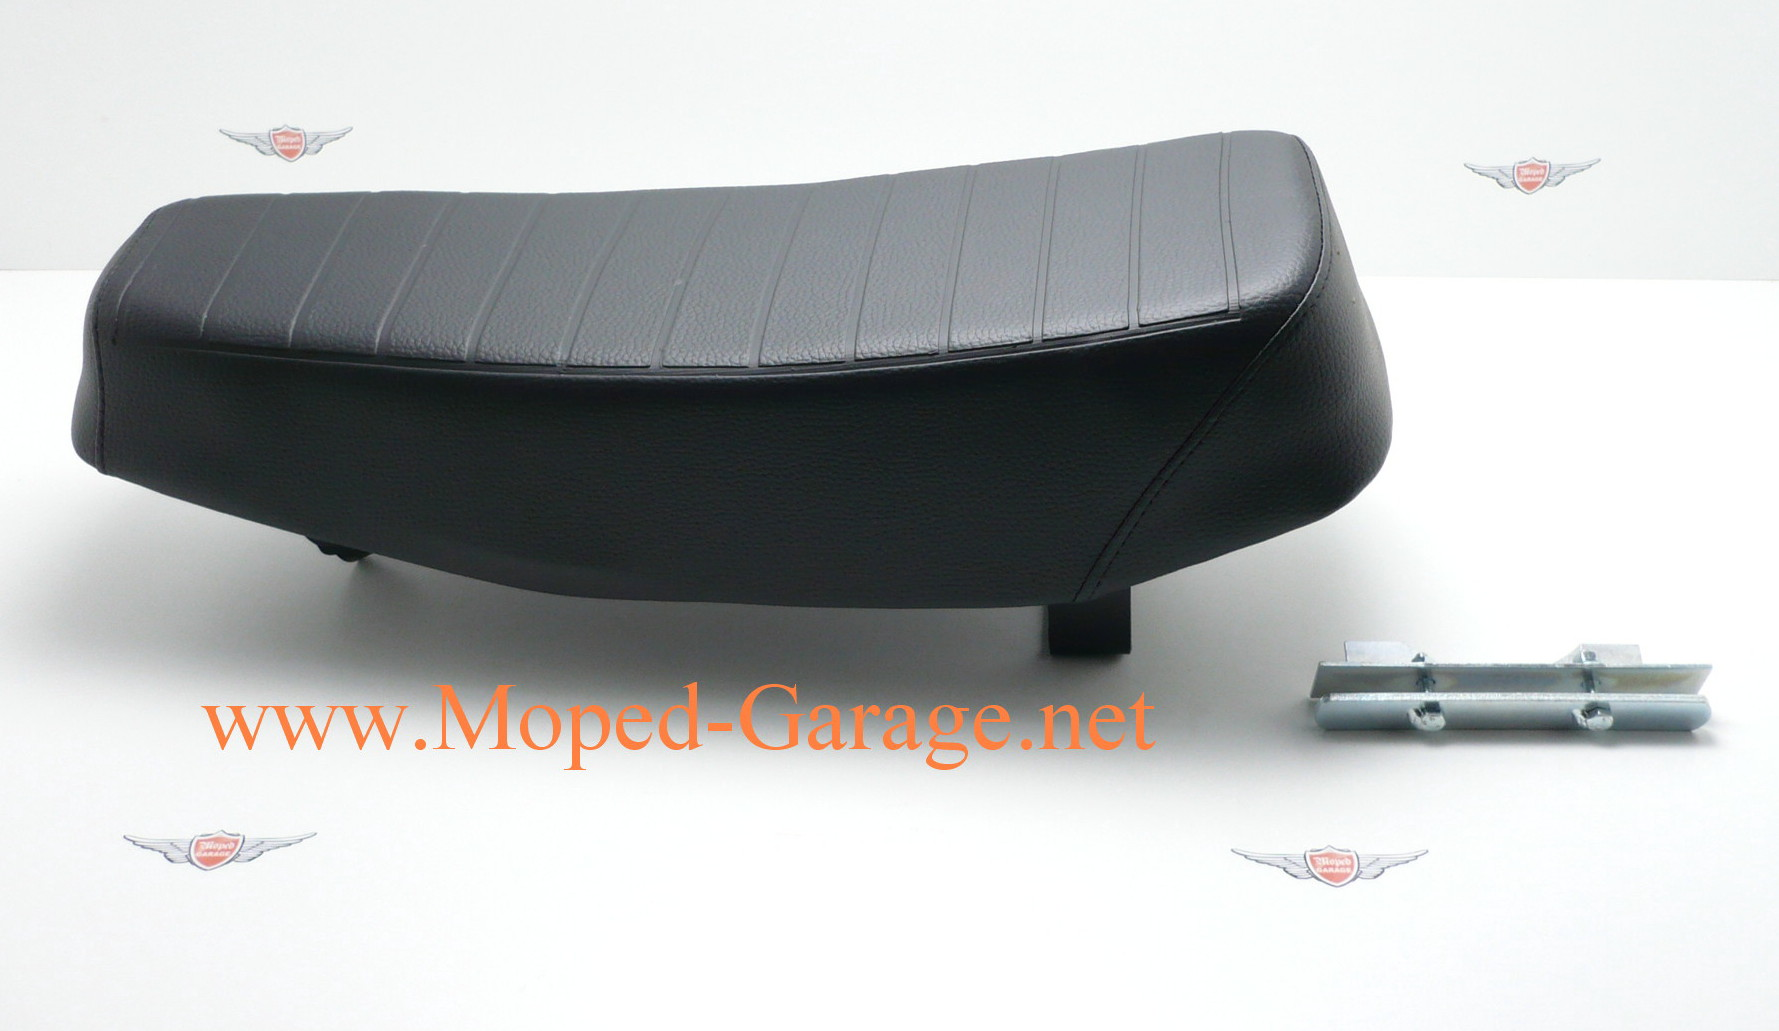 moped peugeot 103 camino prima mofa moped. Black Bedroom Furniture Sets. Home Design Ideas